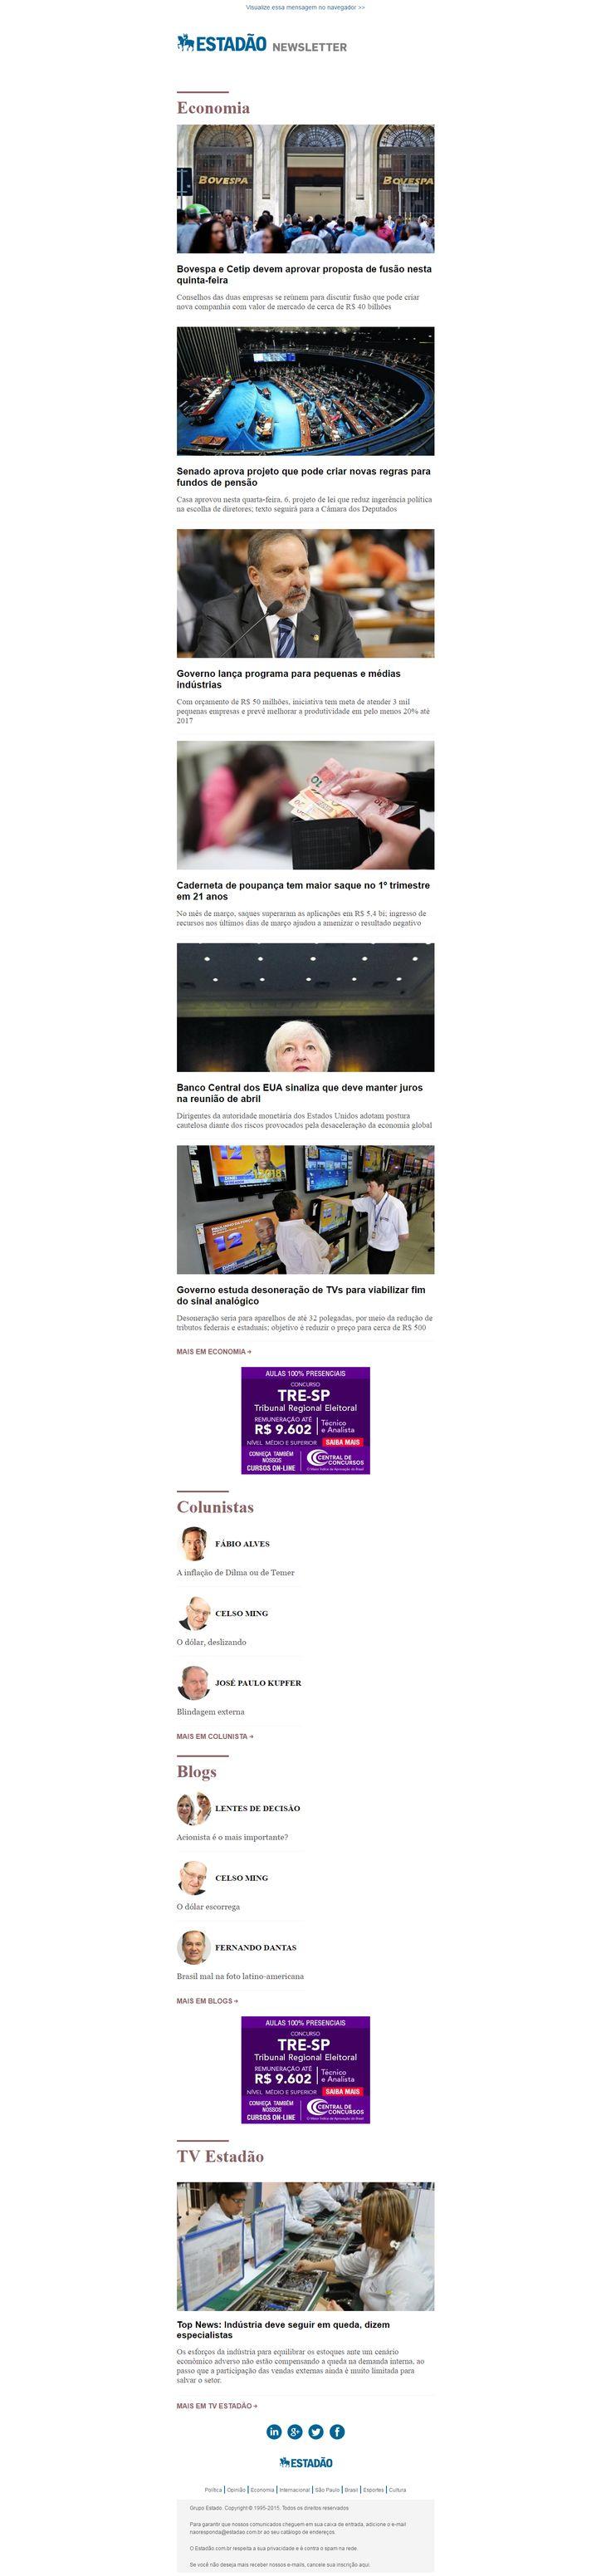 Newsletter Estadão Economia